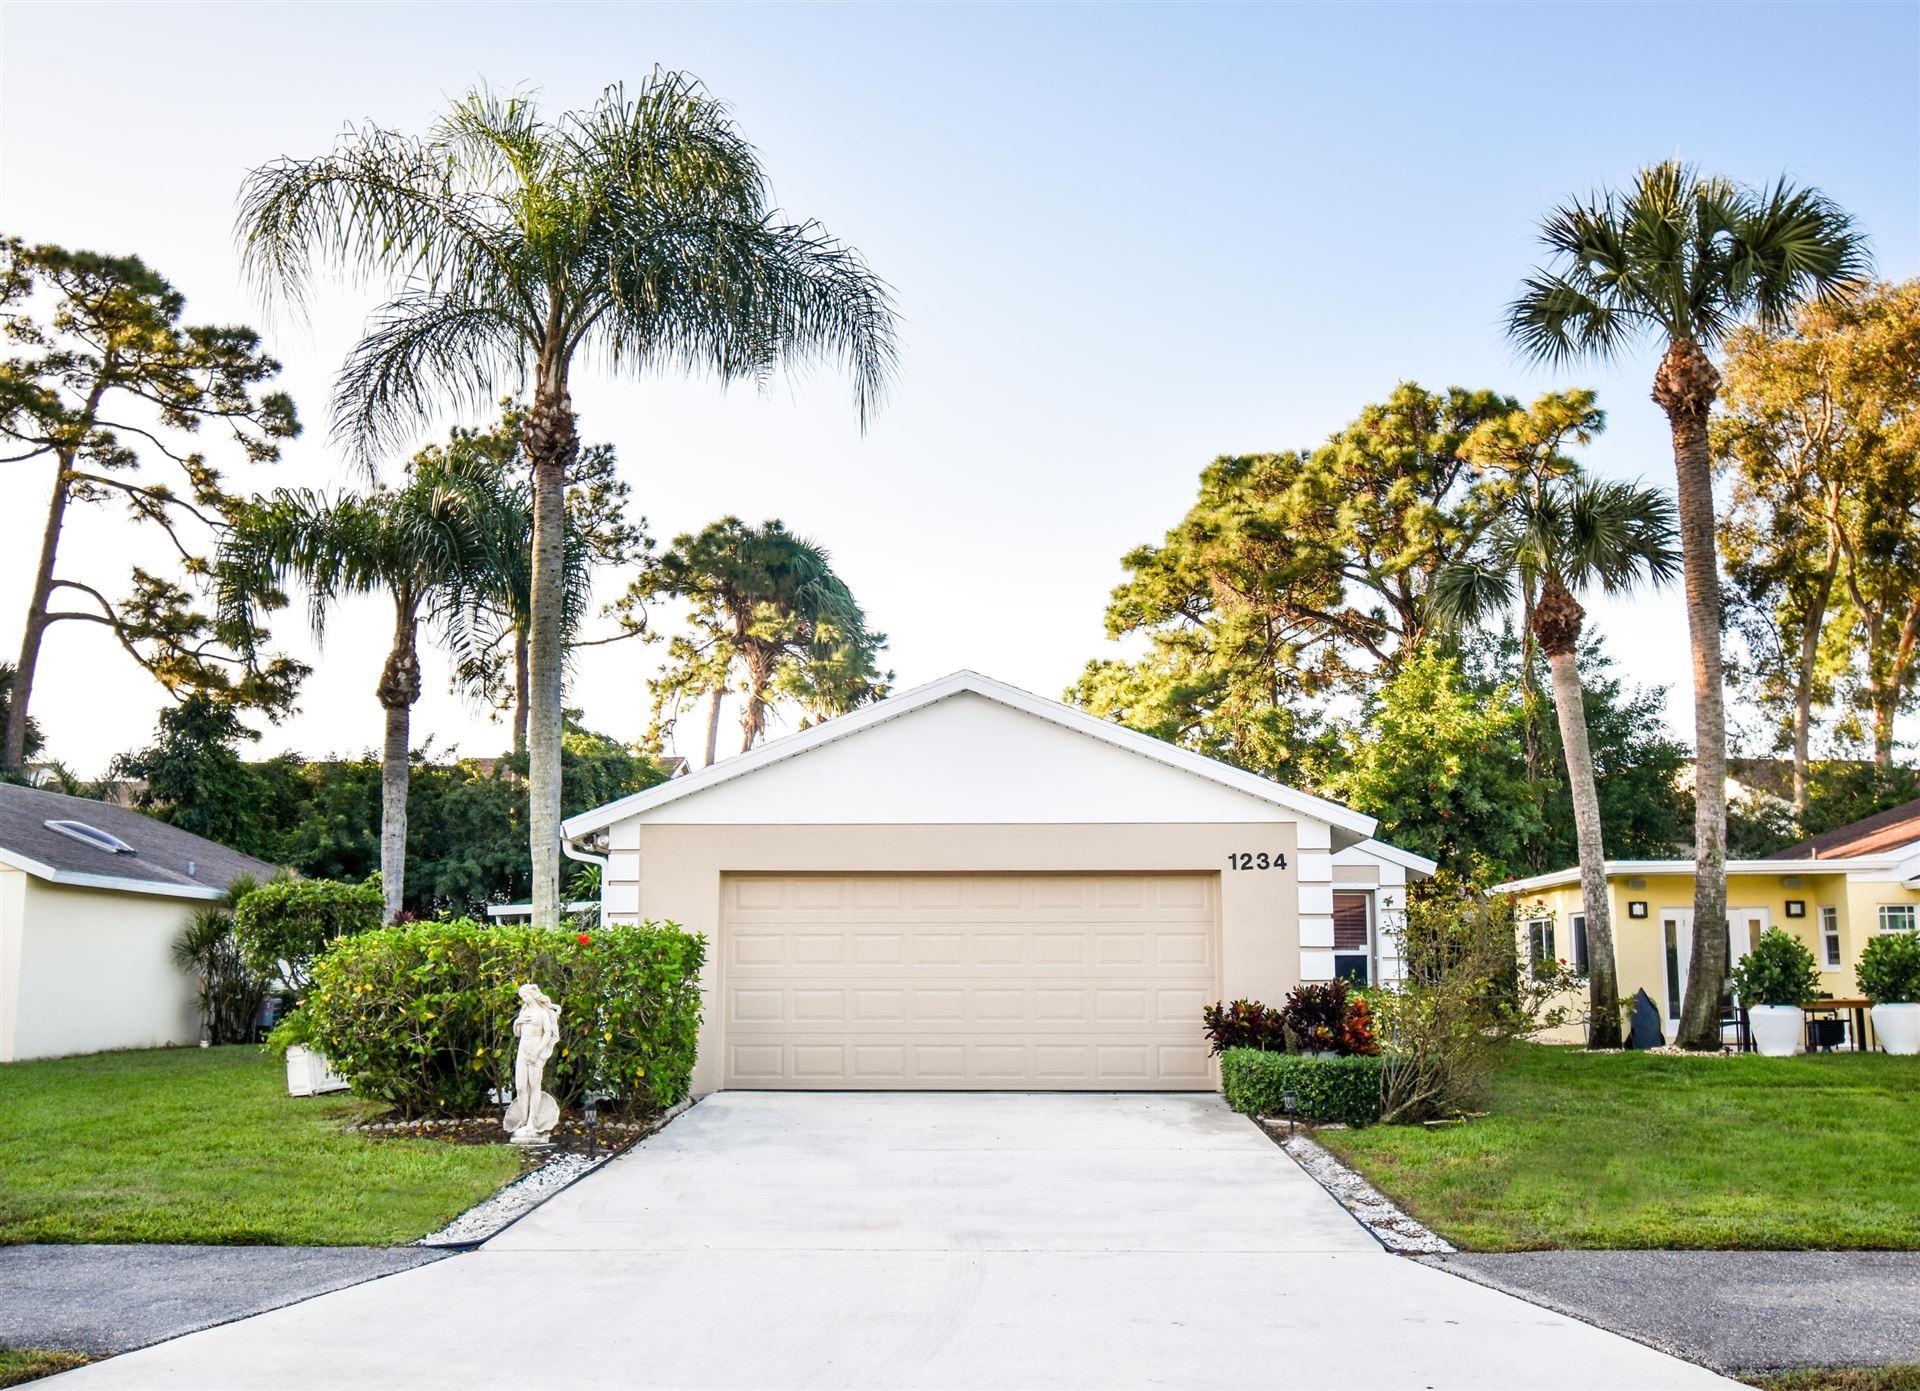 1234 Pine Sage Circle, West Palm Beach, FL 33409 - #: RX-10677883